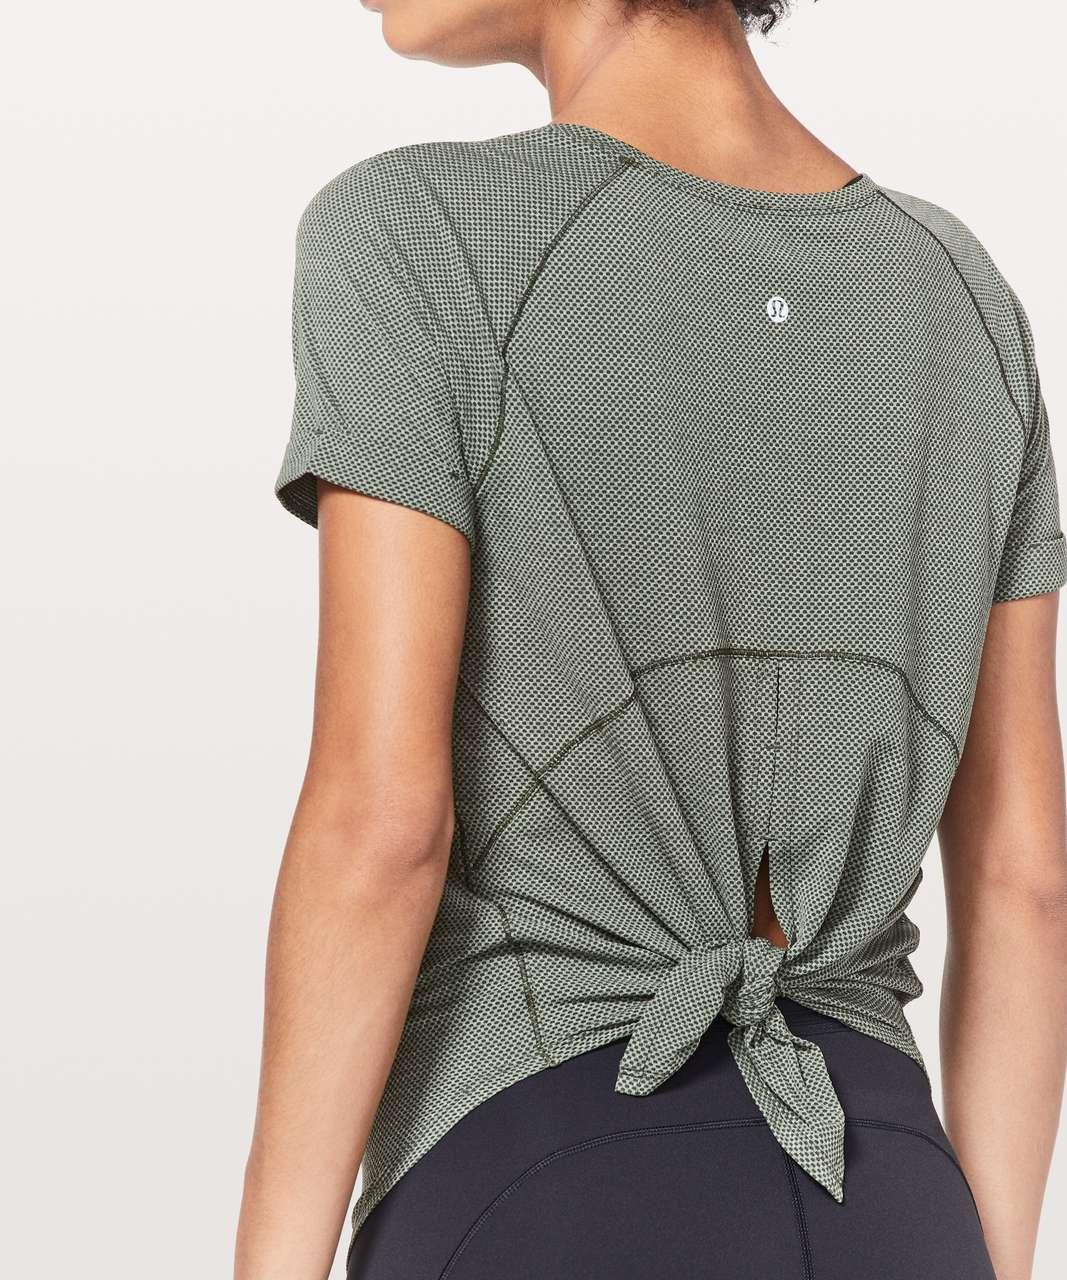 Lululemon Open Up Tie Back Tee - Heathered Camo Green / Camo Green